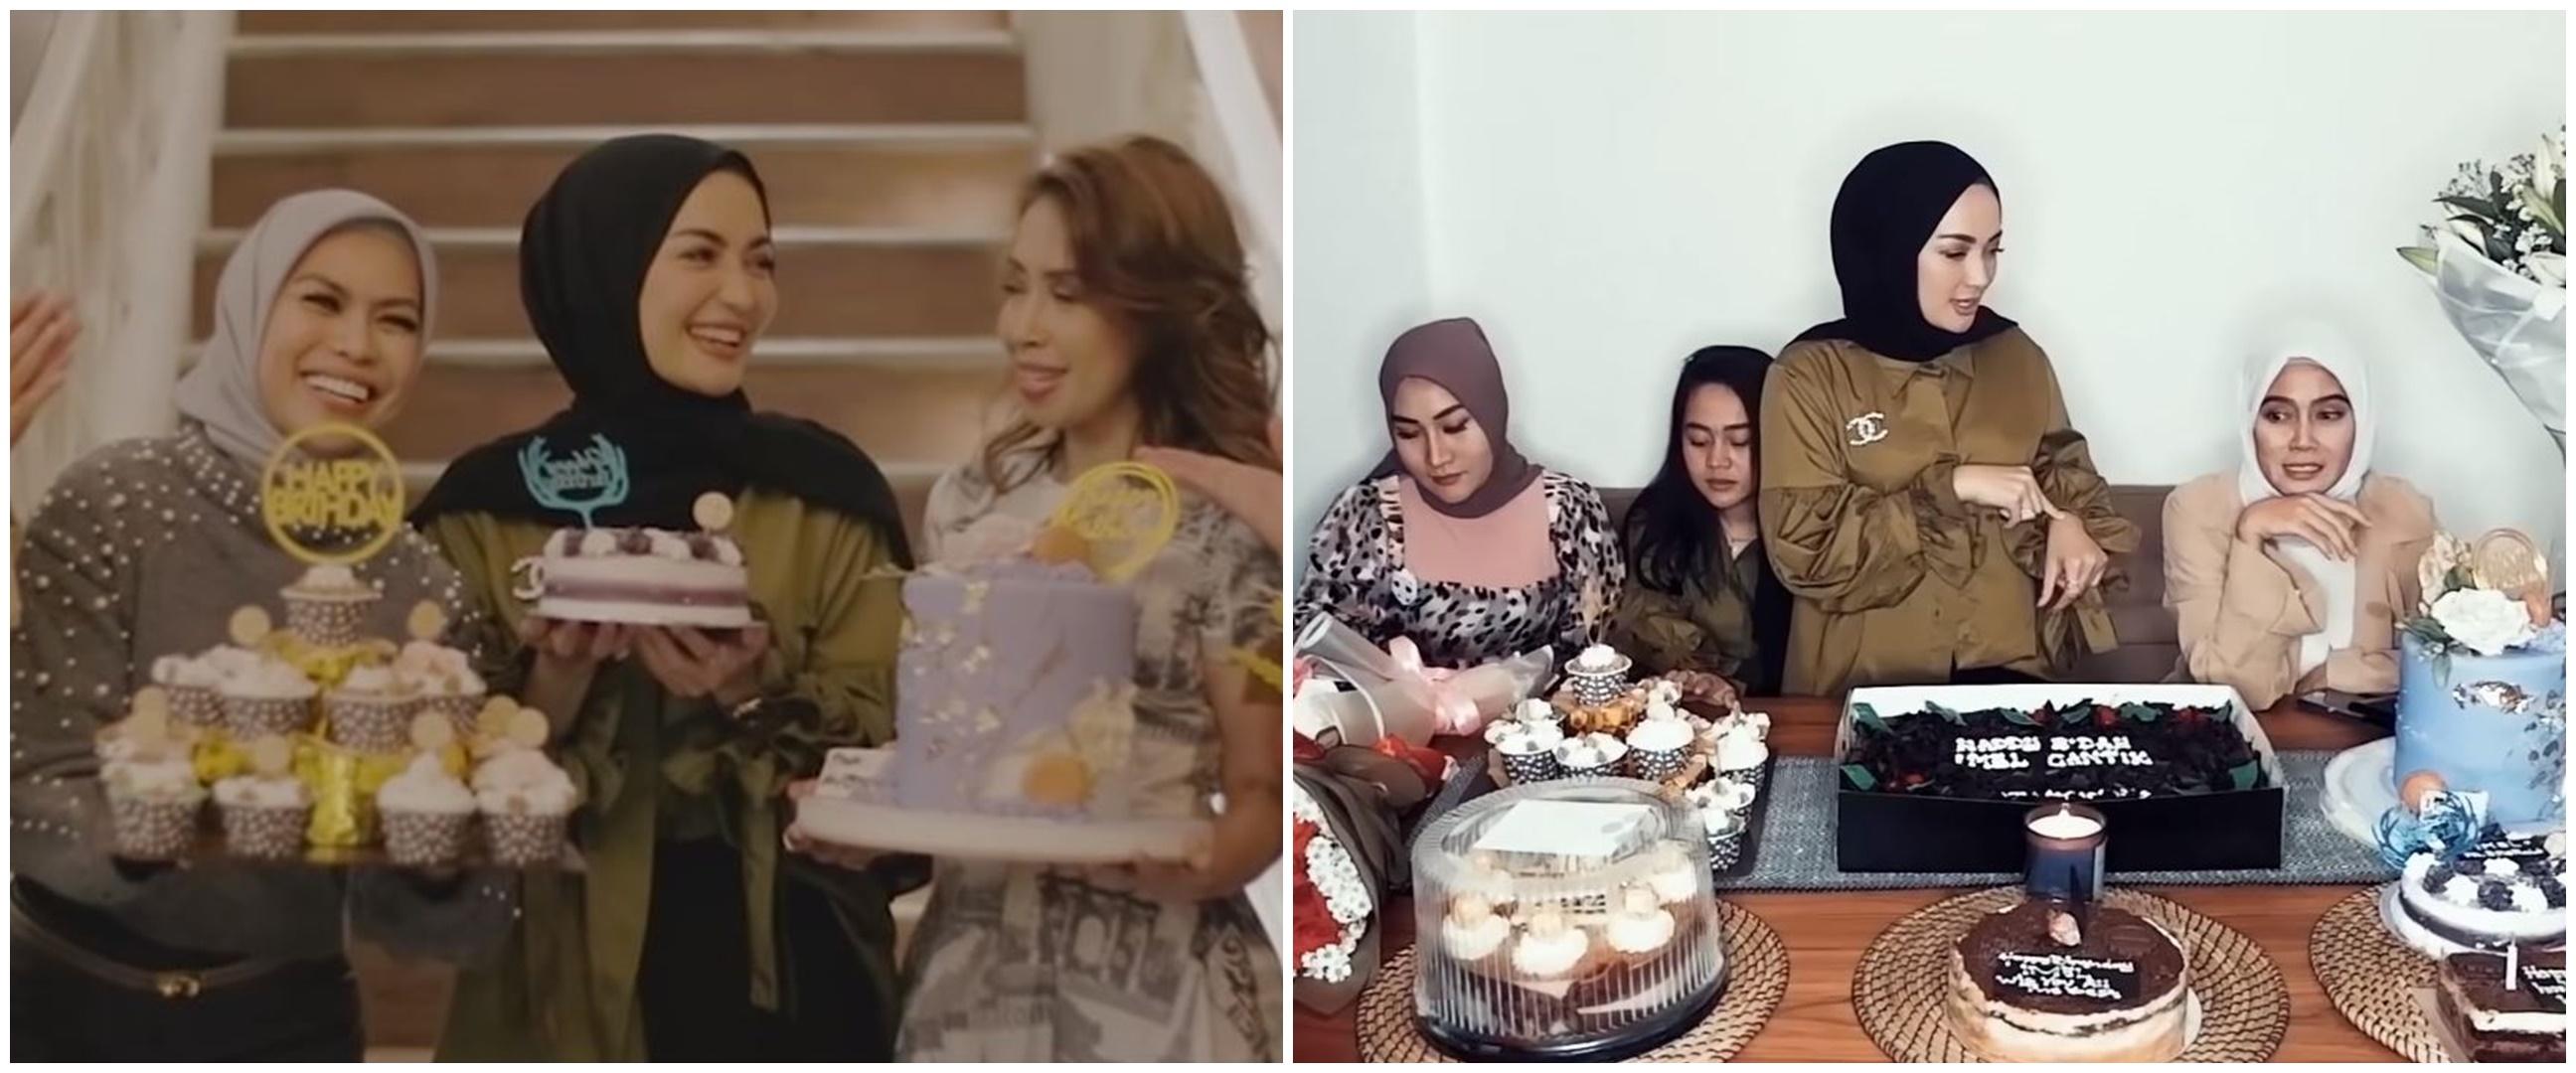 8 Momen perayaan ulang tahun Imel Putri ke-32, sederhana tapi meriah